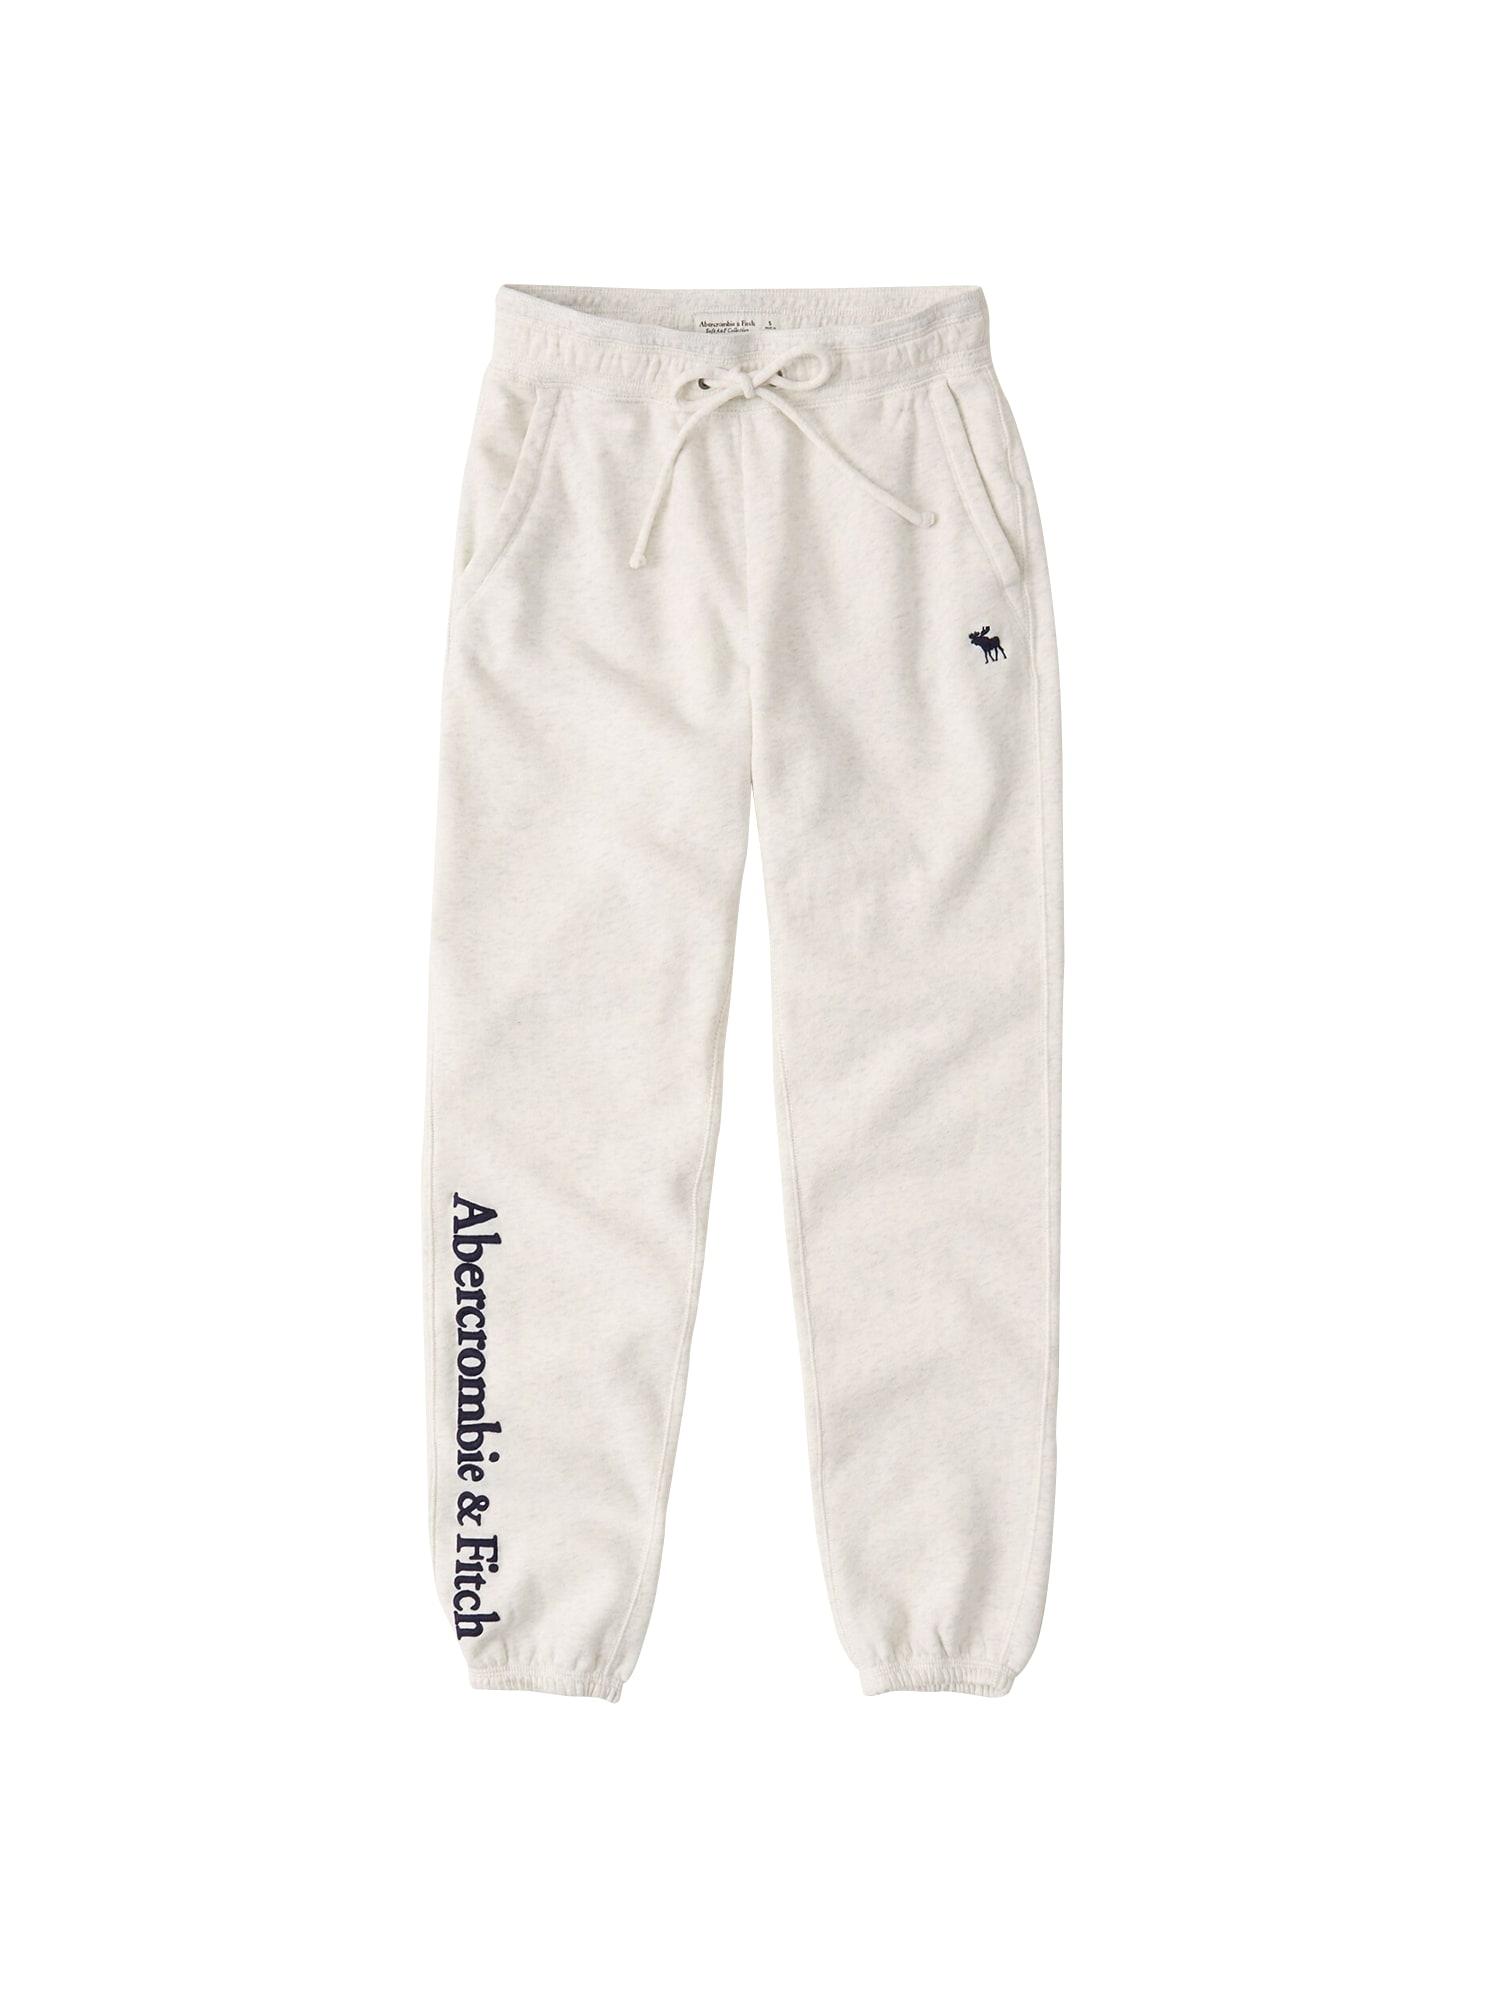 Abercrombie & Fitch Kelnės šviesiai pilka